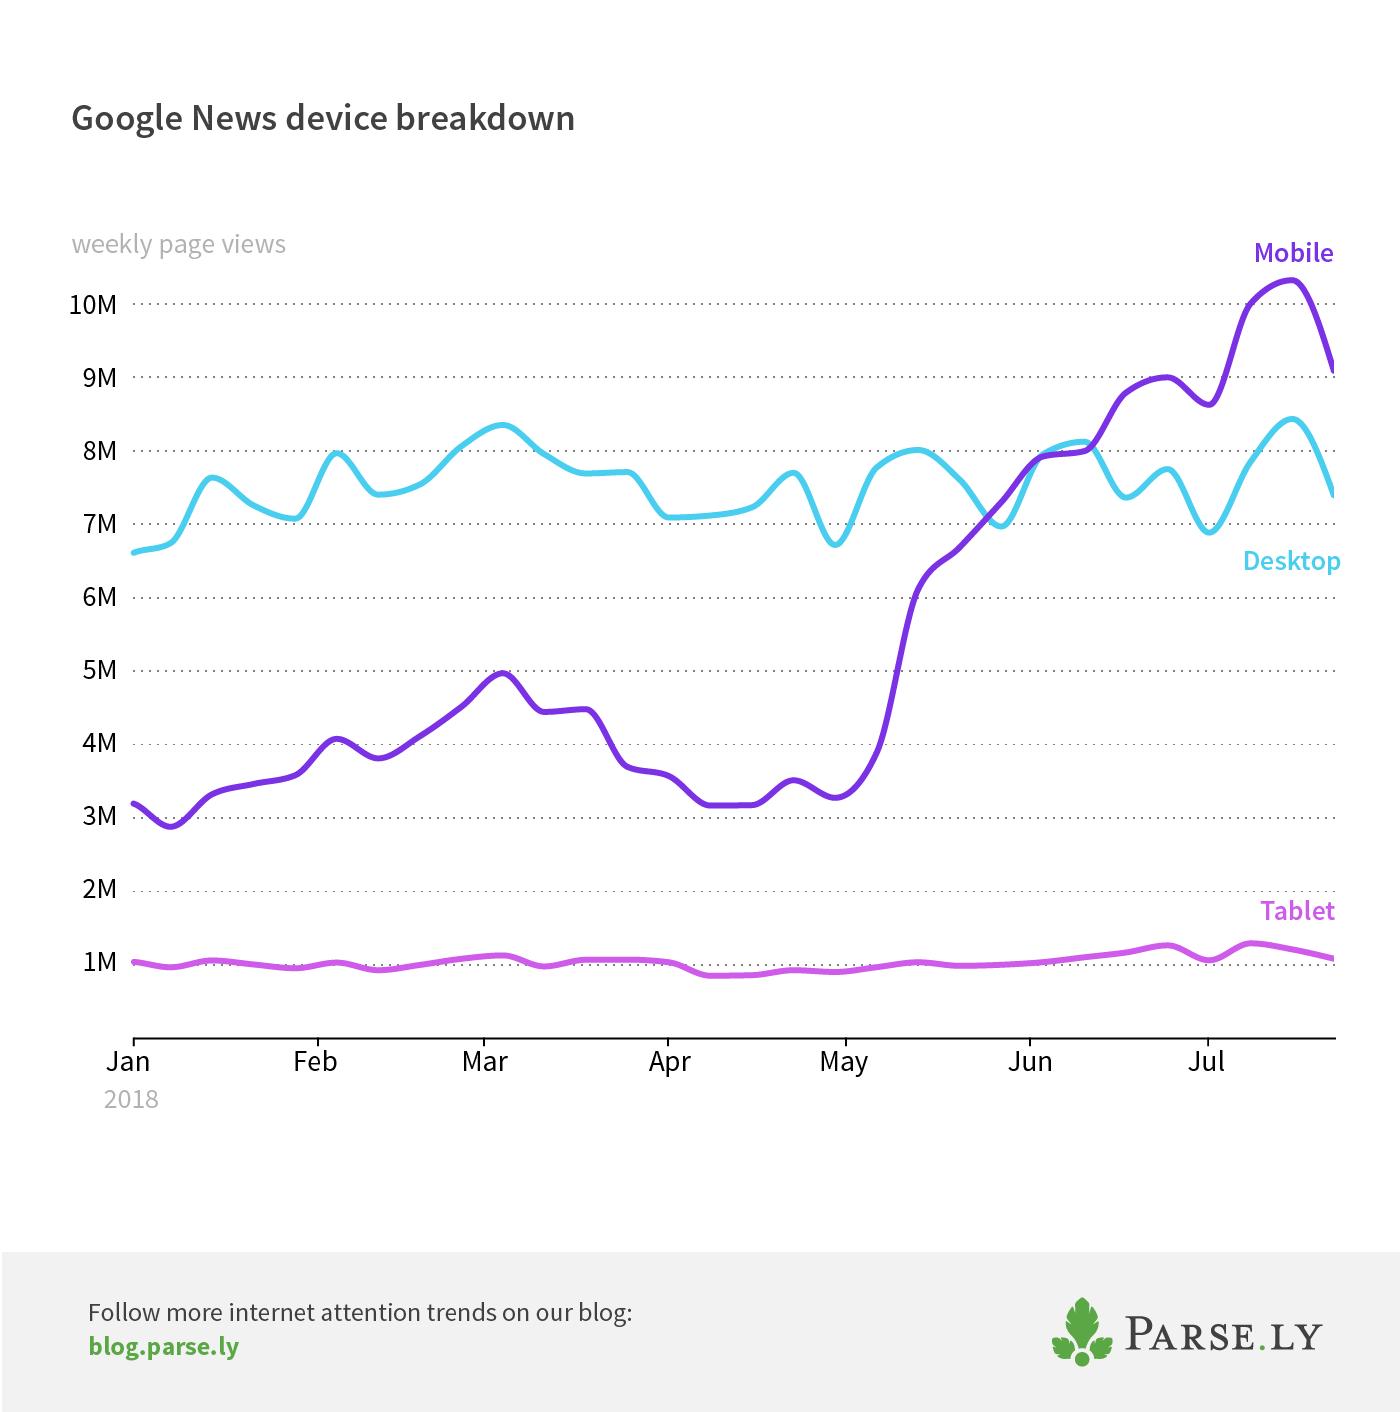 Google News device breakdown